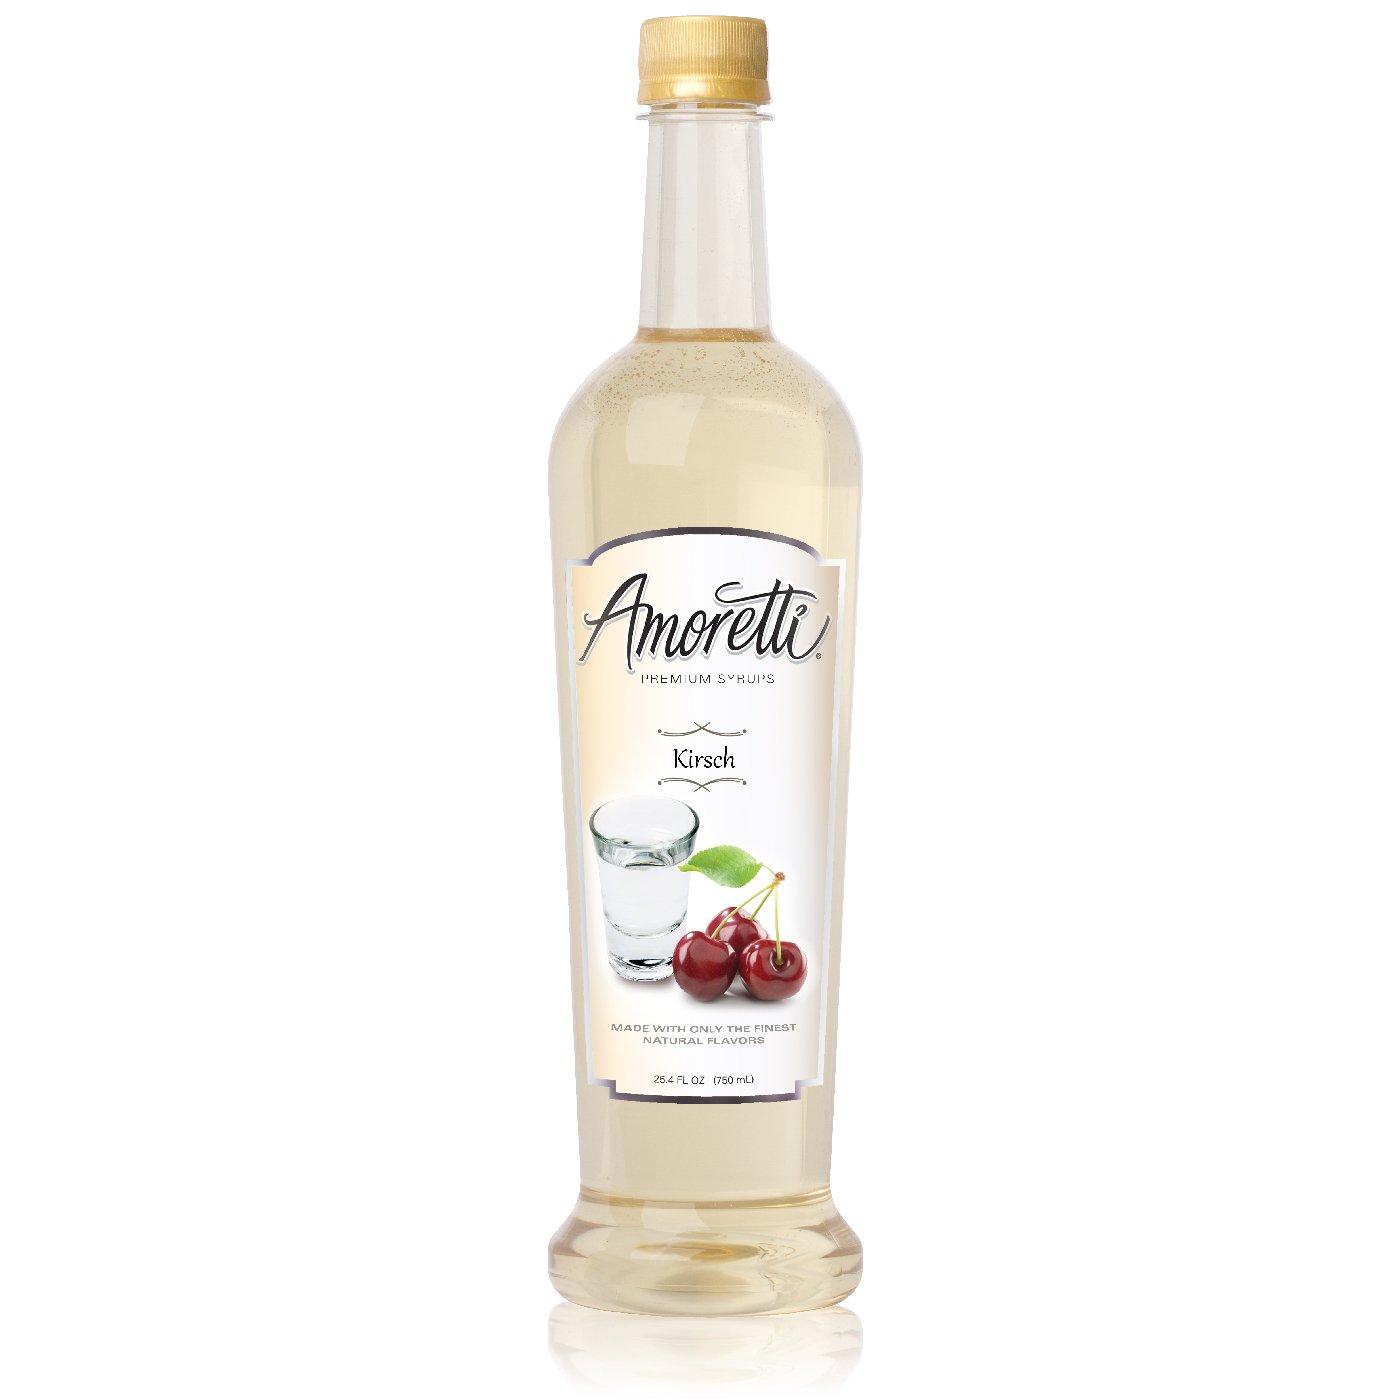 Amoretti Premium Syrup, Kirsch, 25.4 Ounce